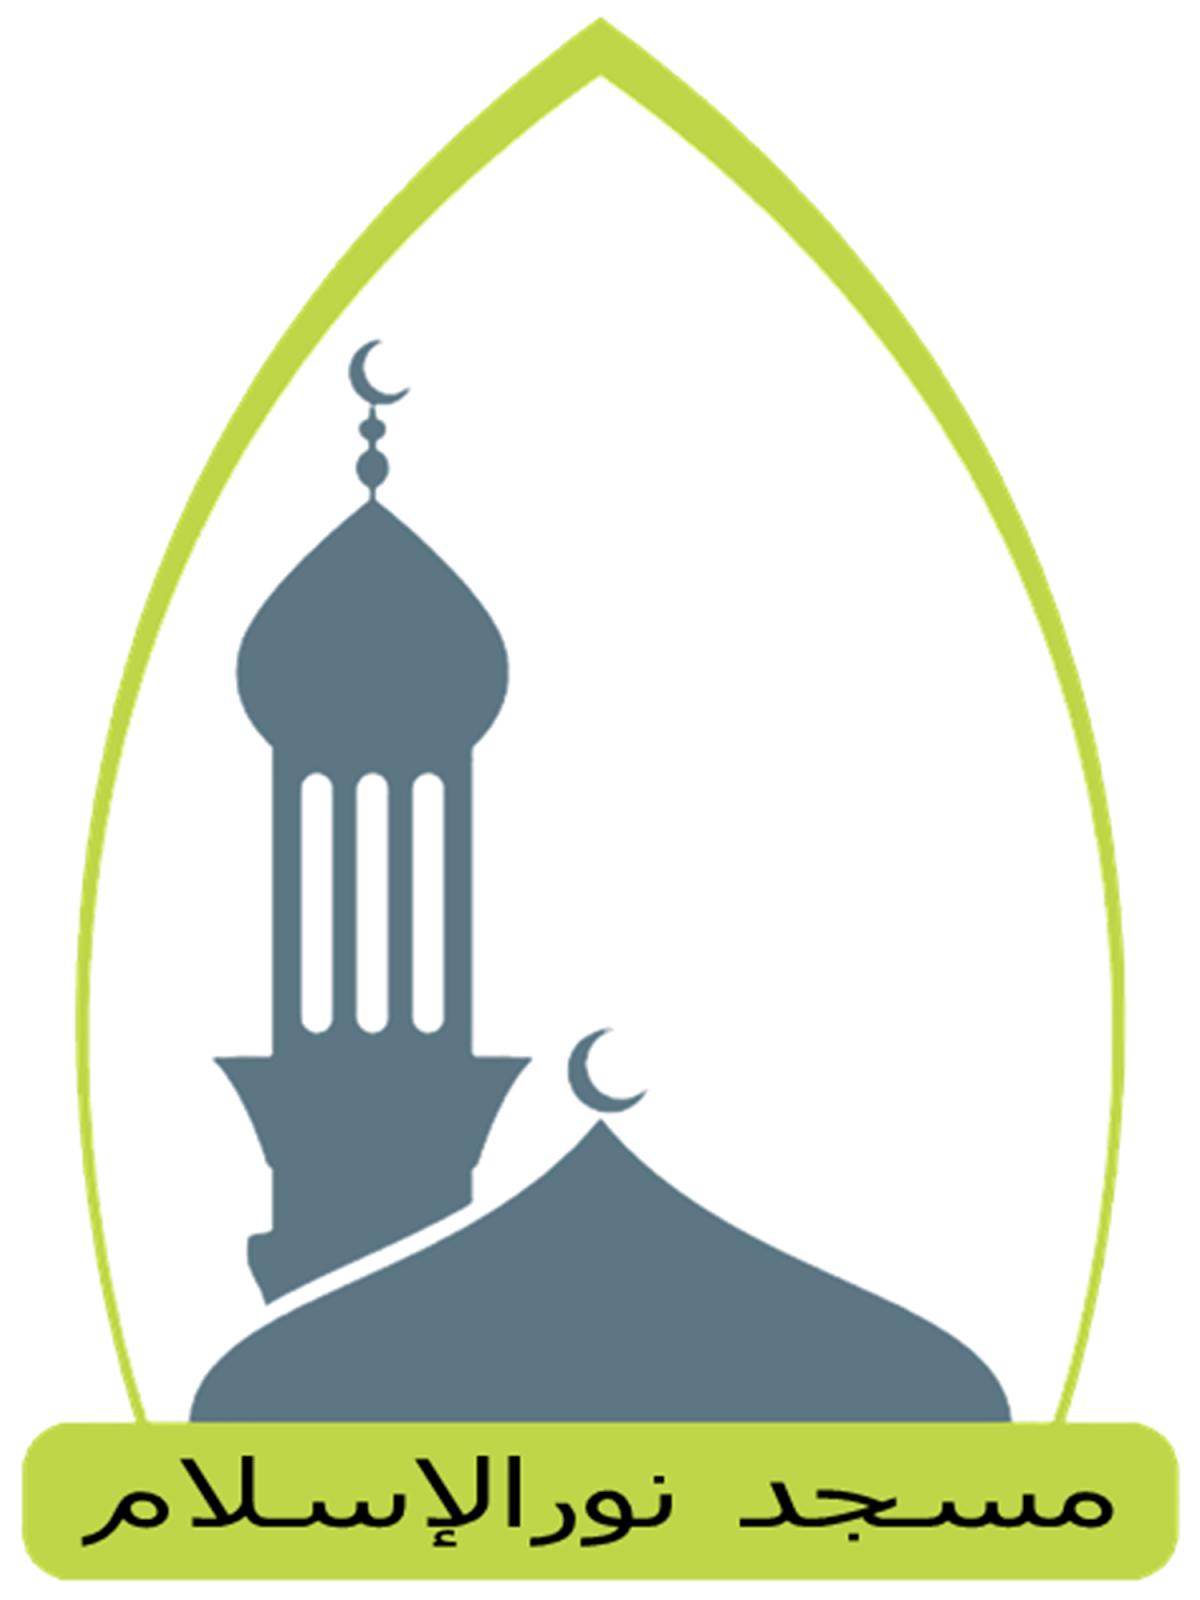 Contoh Logo Dkm Masjid